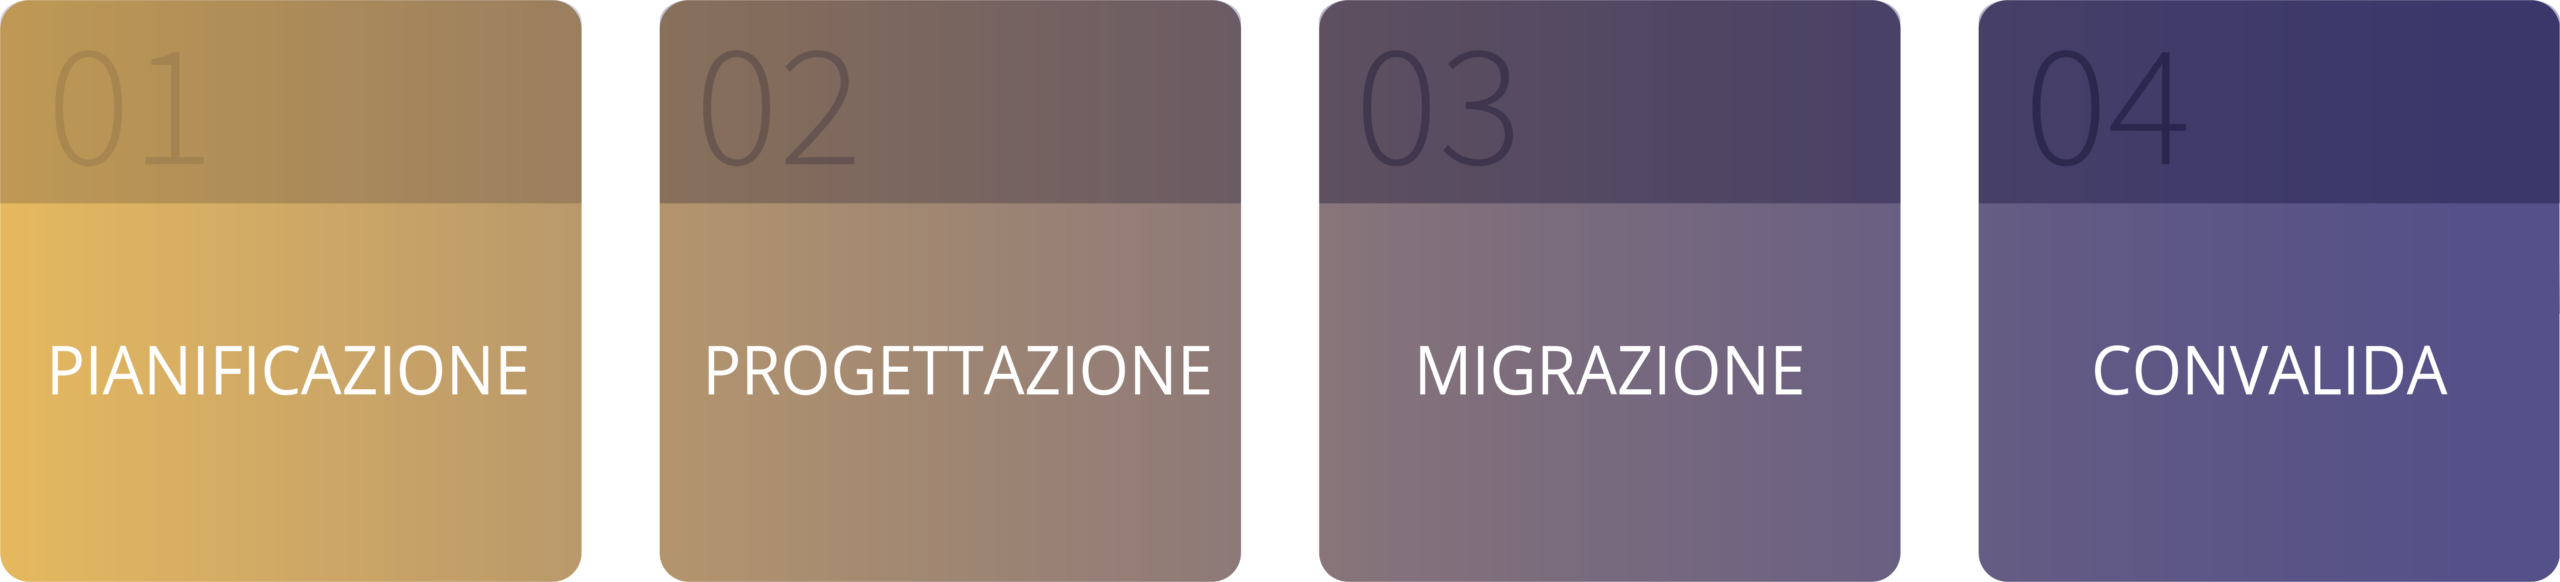 fasi migrazione cloud